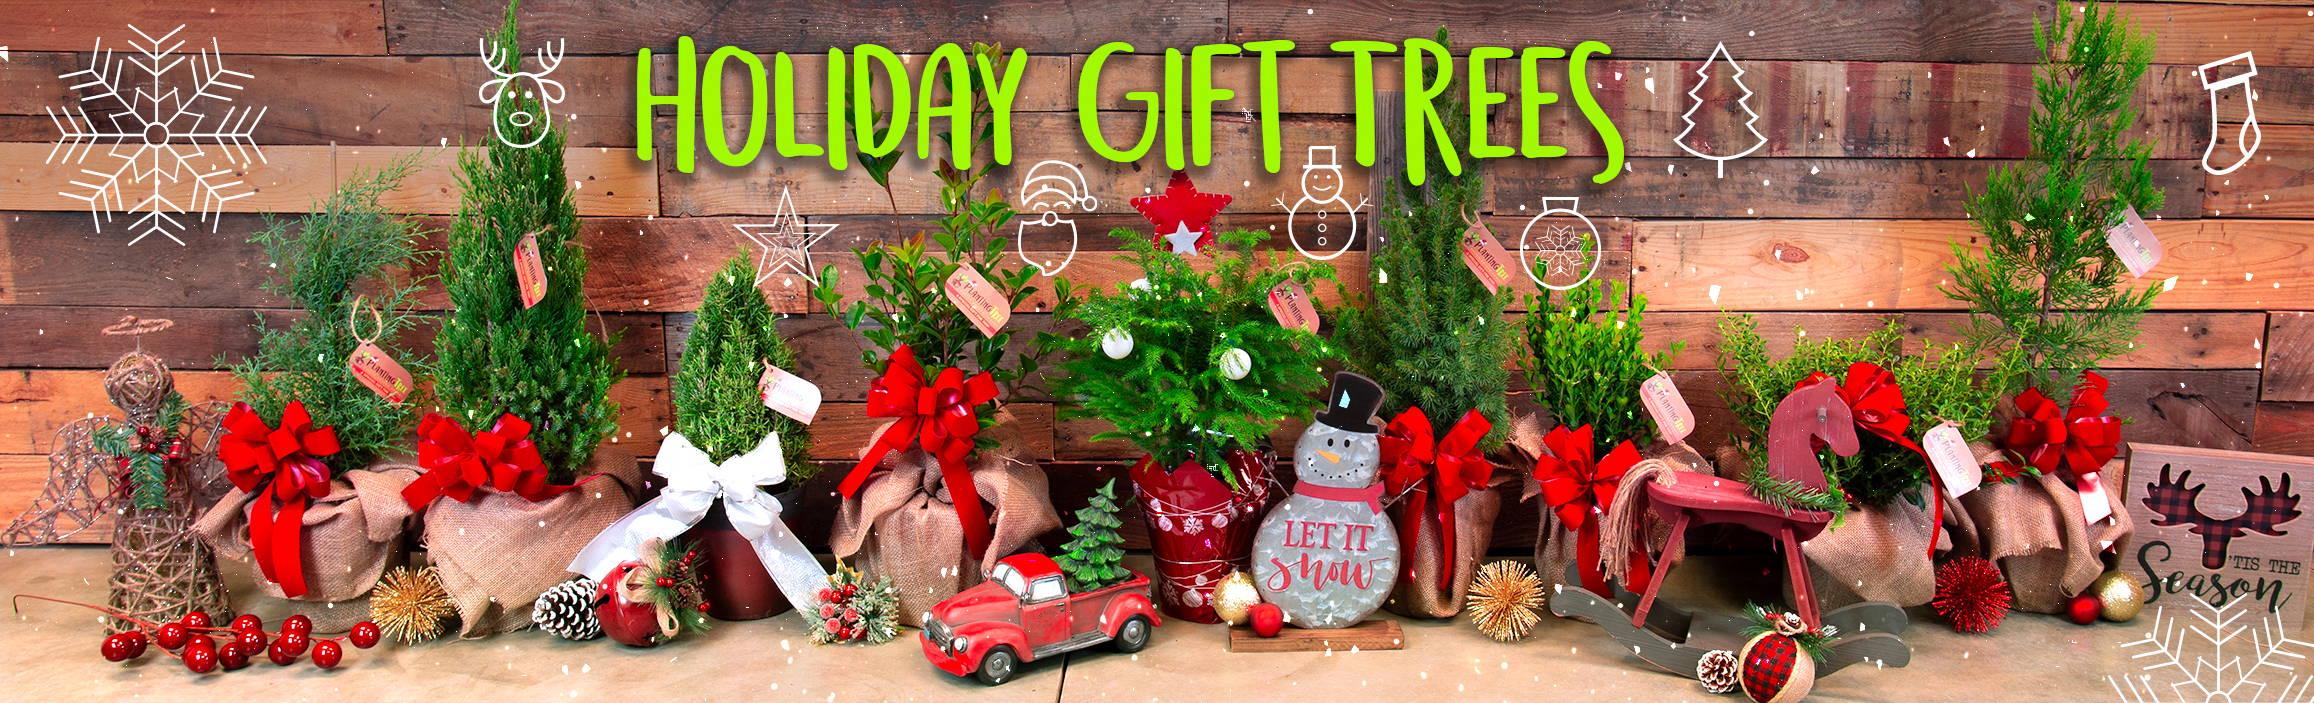 Holiday Gift Trees - Send A Mini Christmas Tree